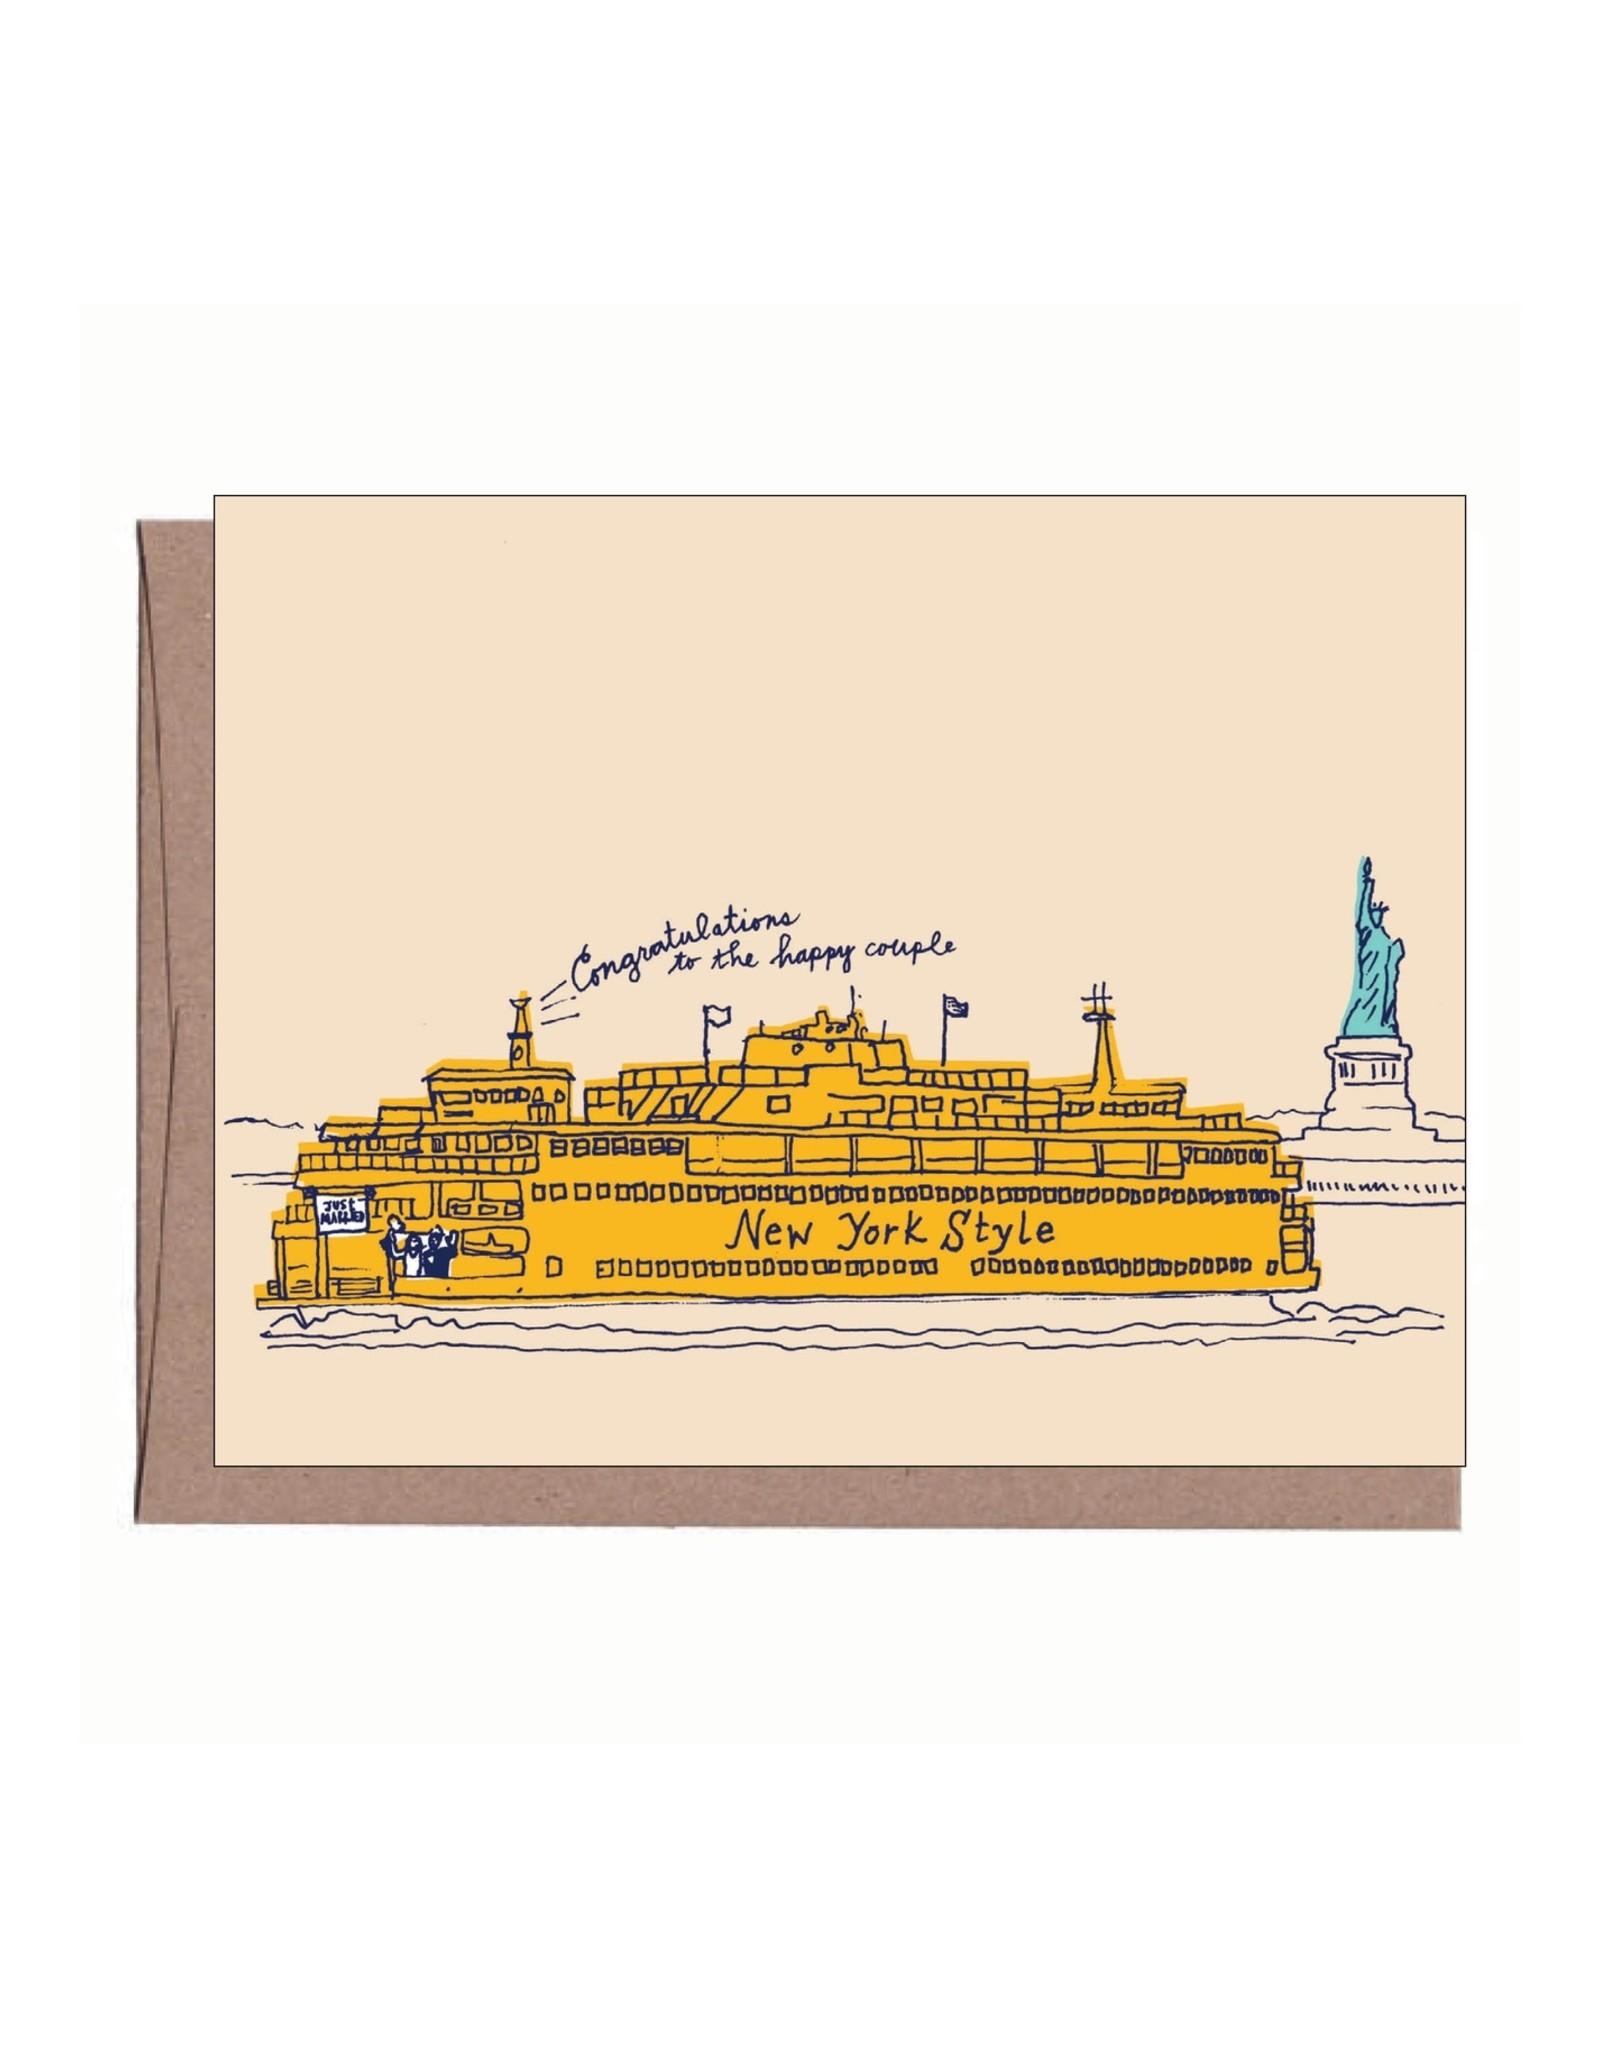 La Familia Green Card - Wedding: Staten Island Ferry